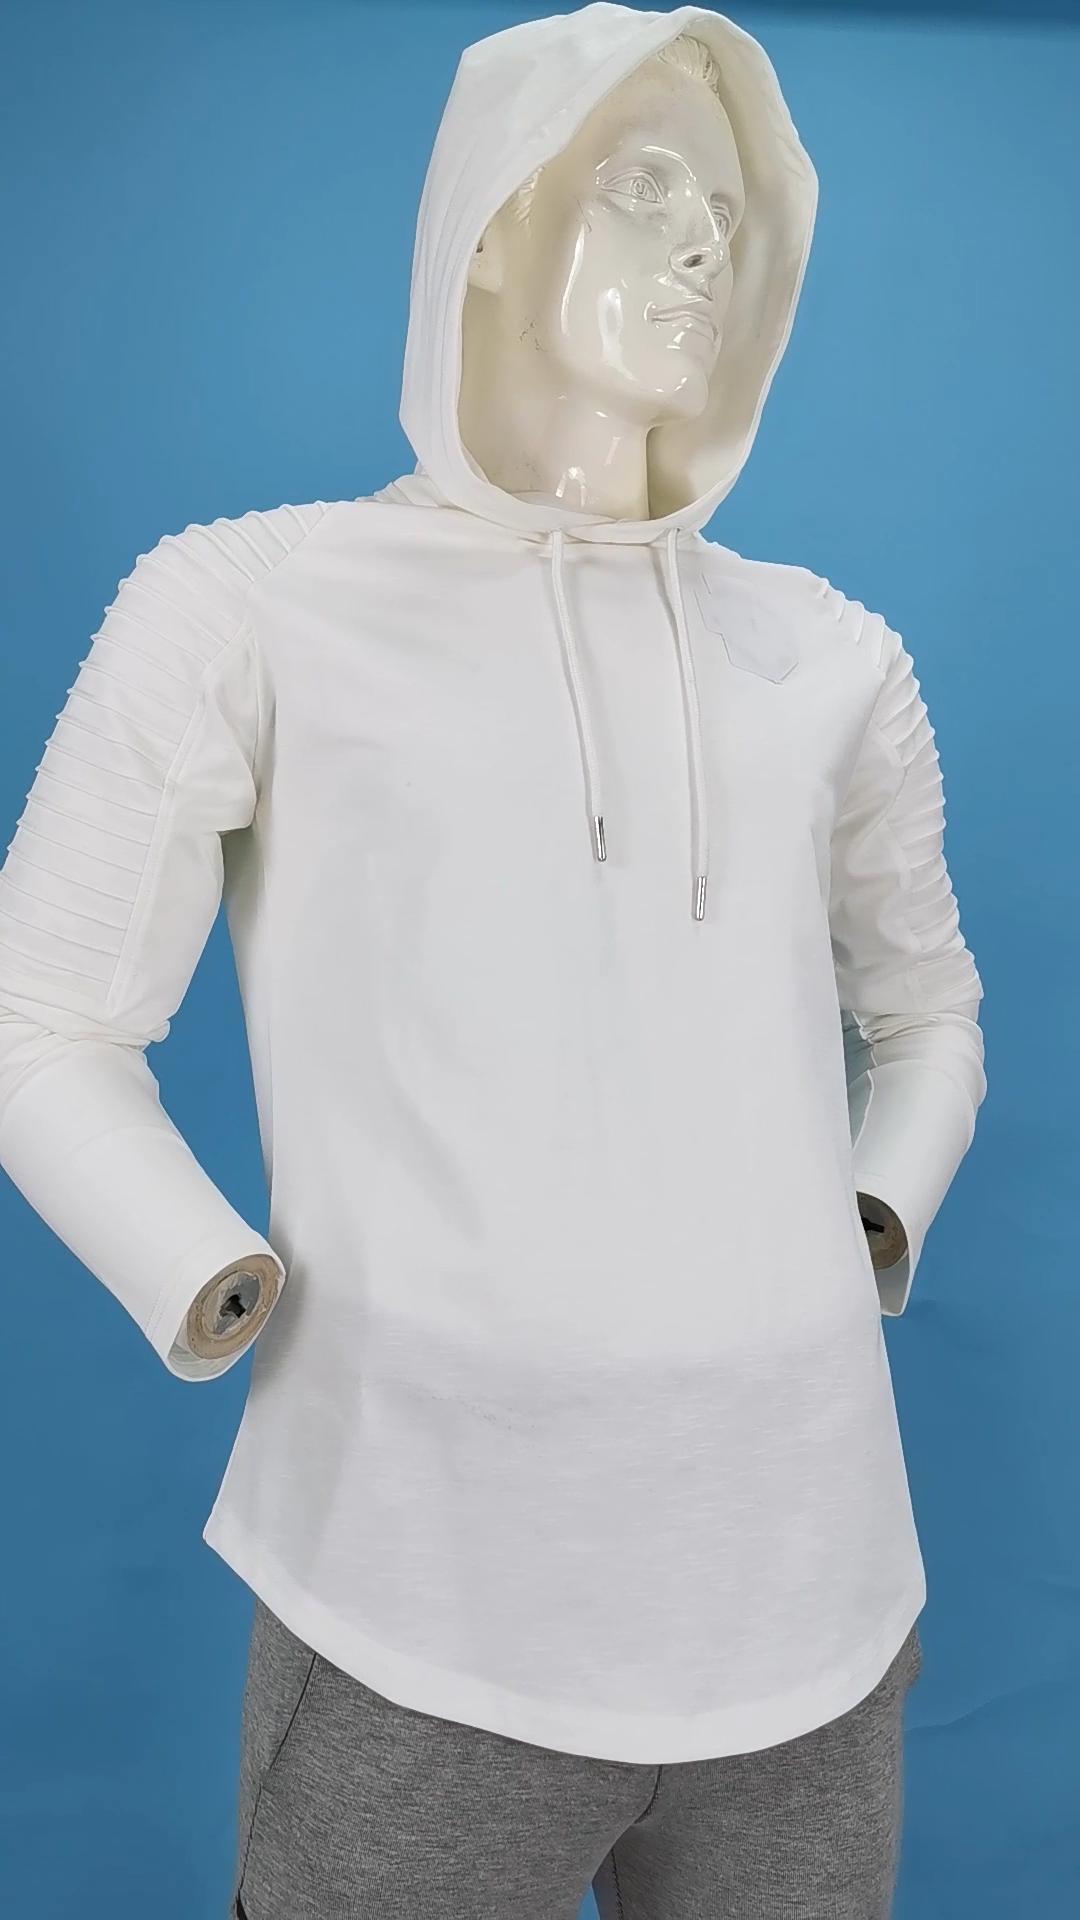 OEM factory men's sportswear fitness muscle fit pullover custom gym hoodies pleated